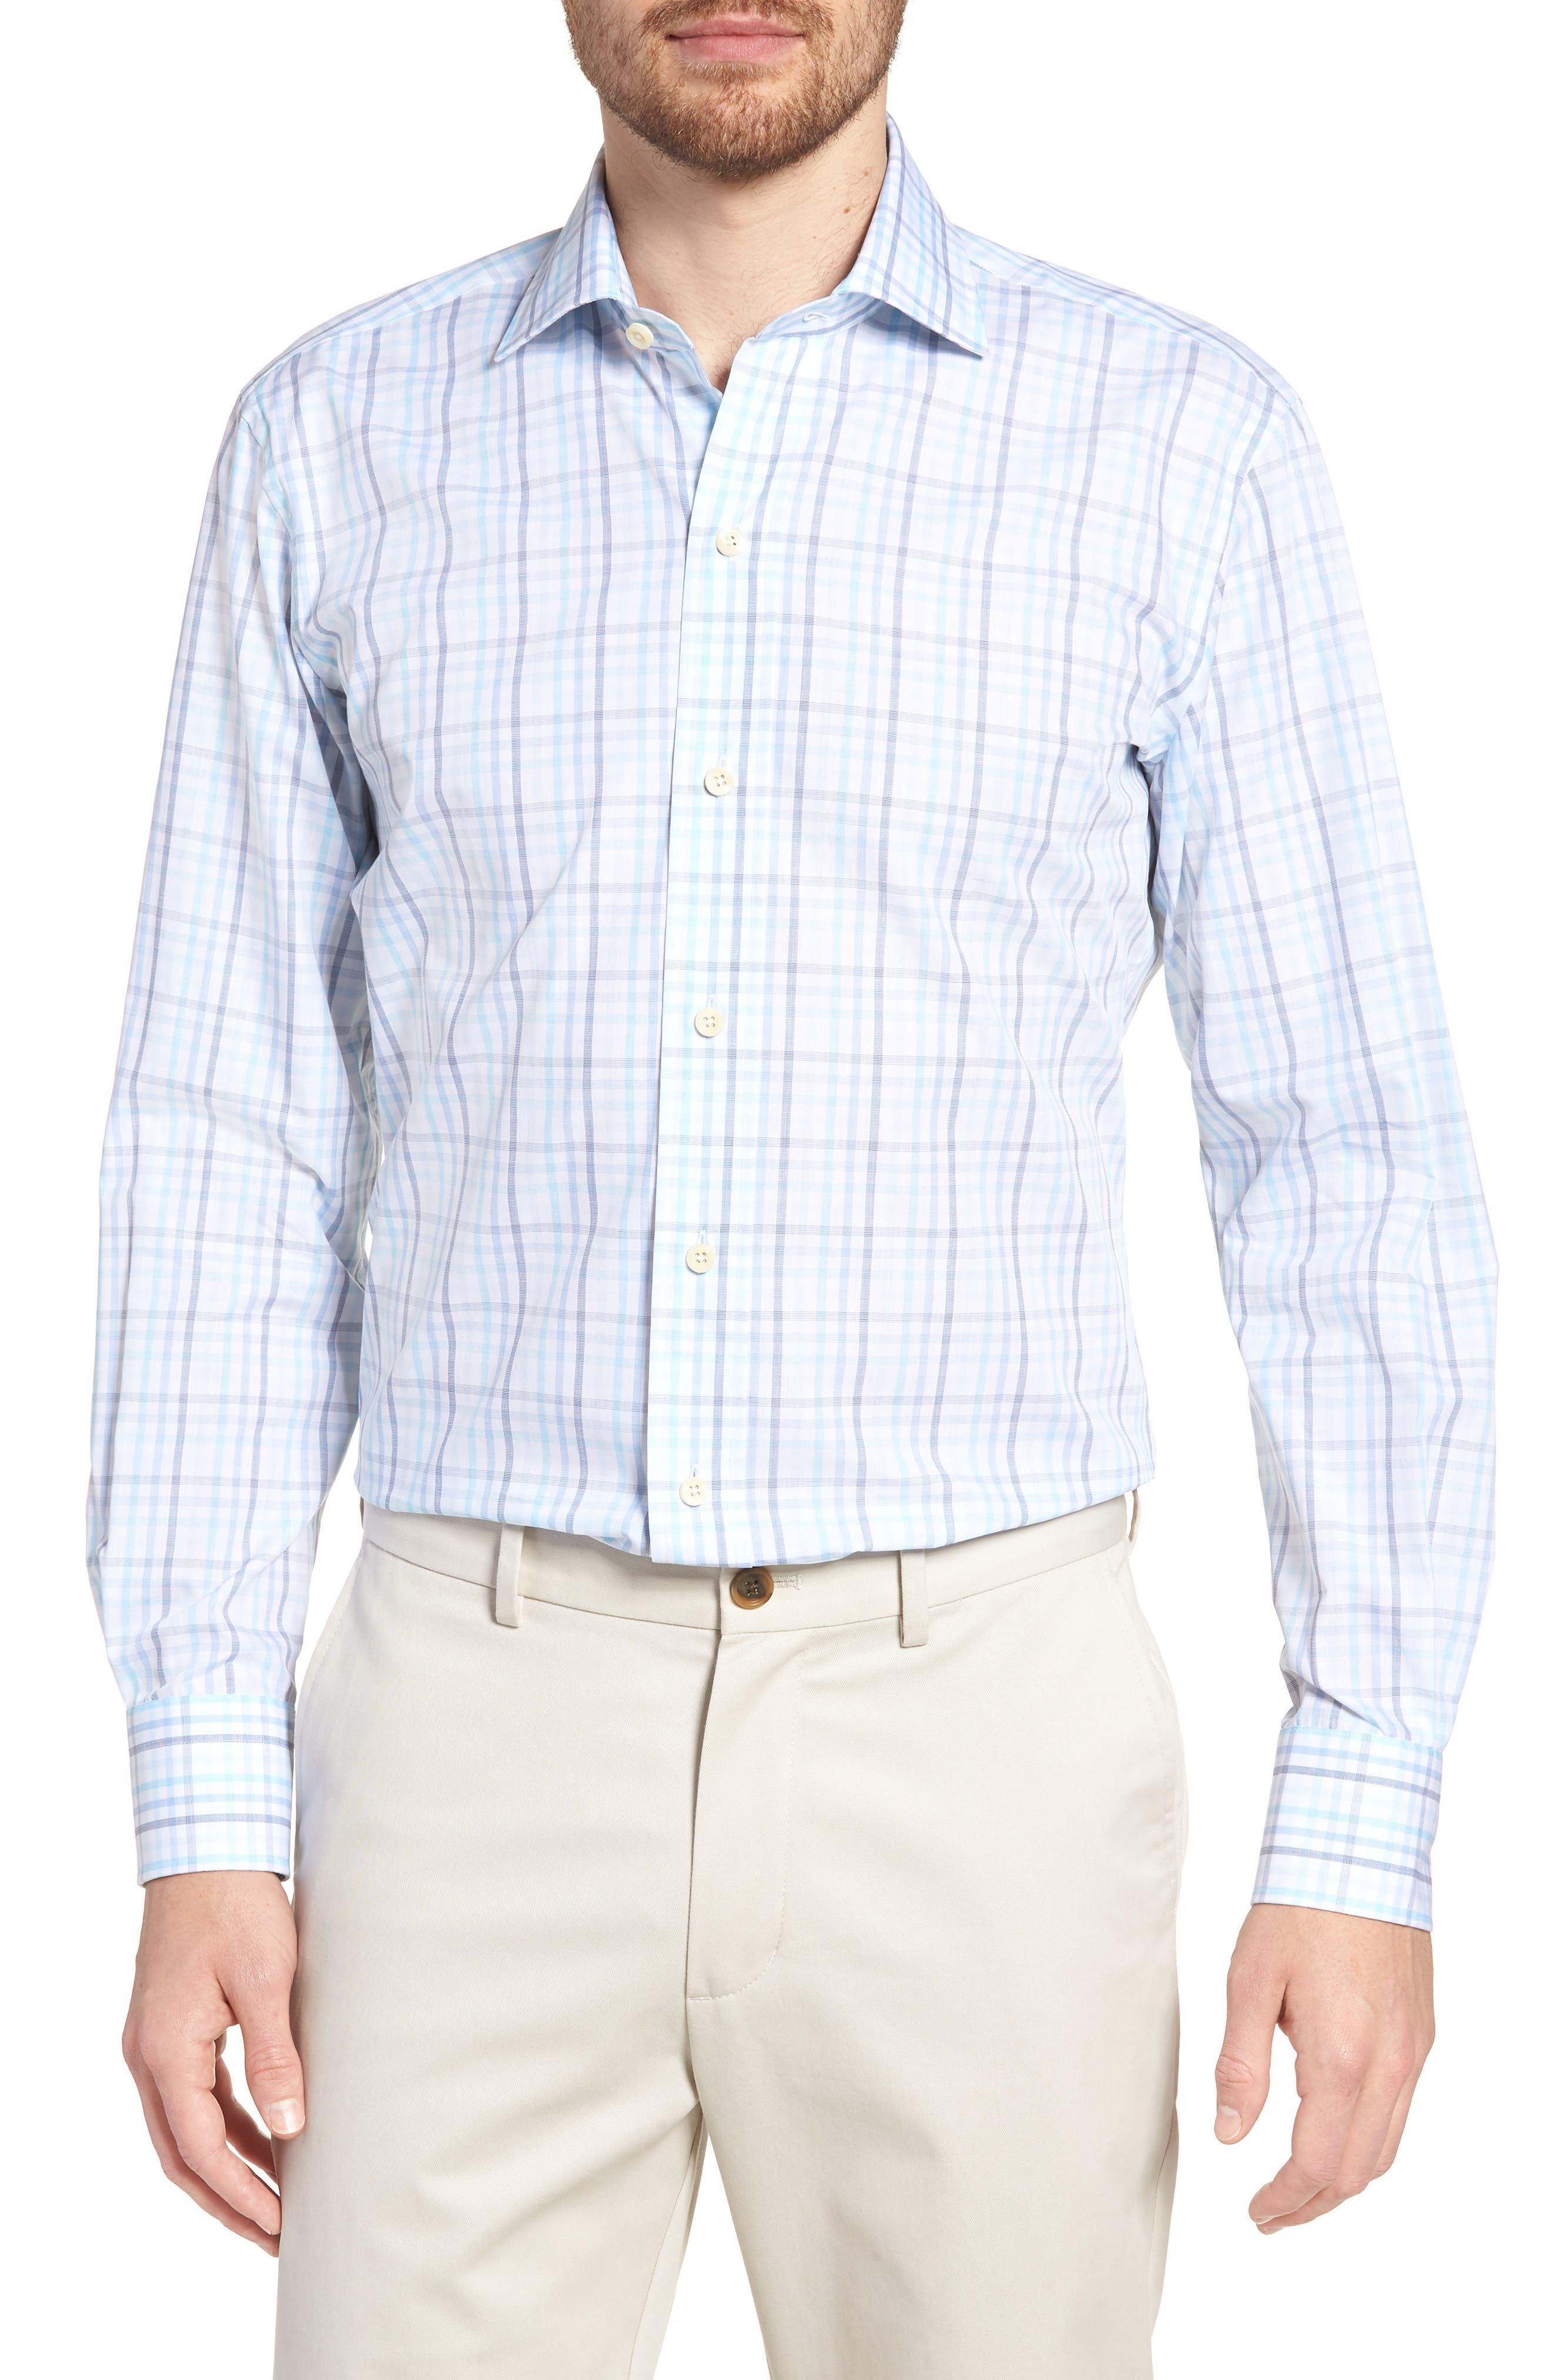 Pelton Slim Fit Check Dress Shirt,                             Main thumbnail 1, color,                             439